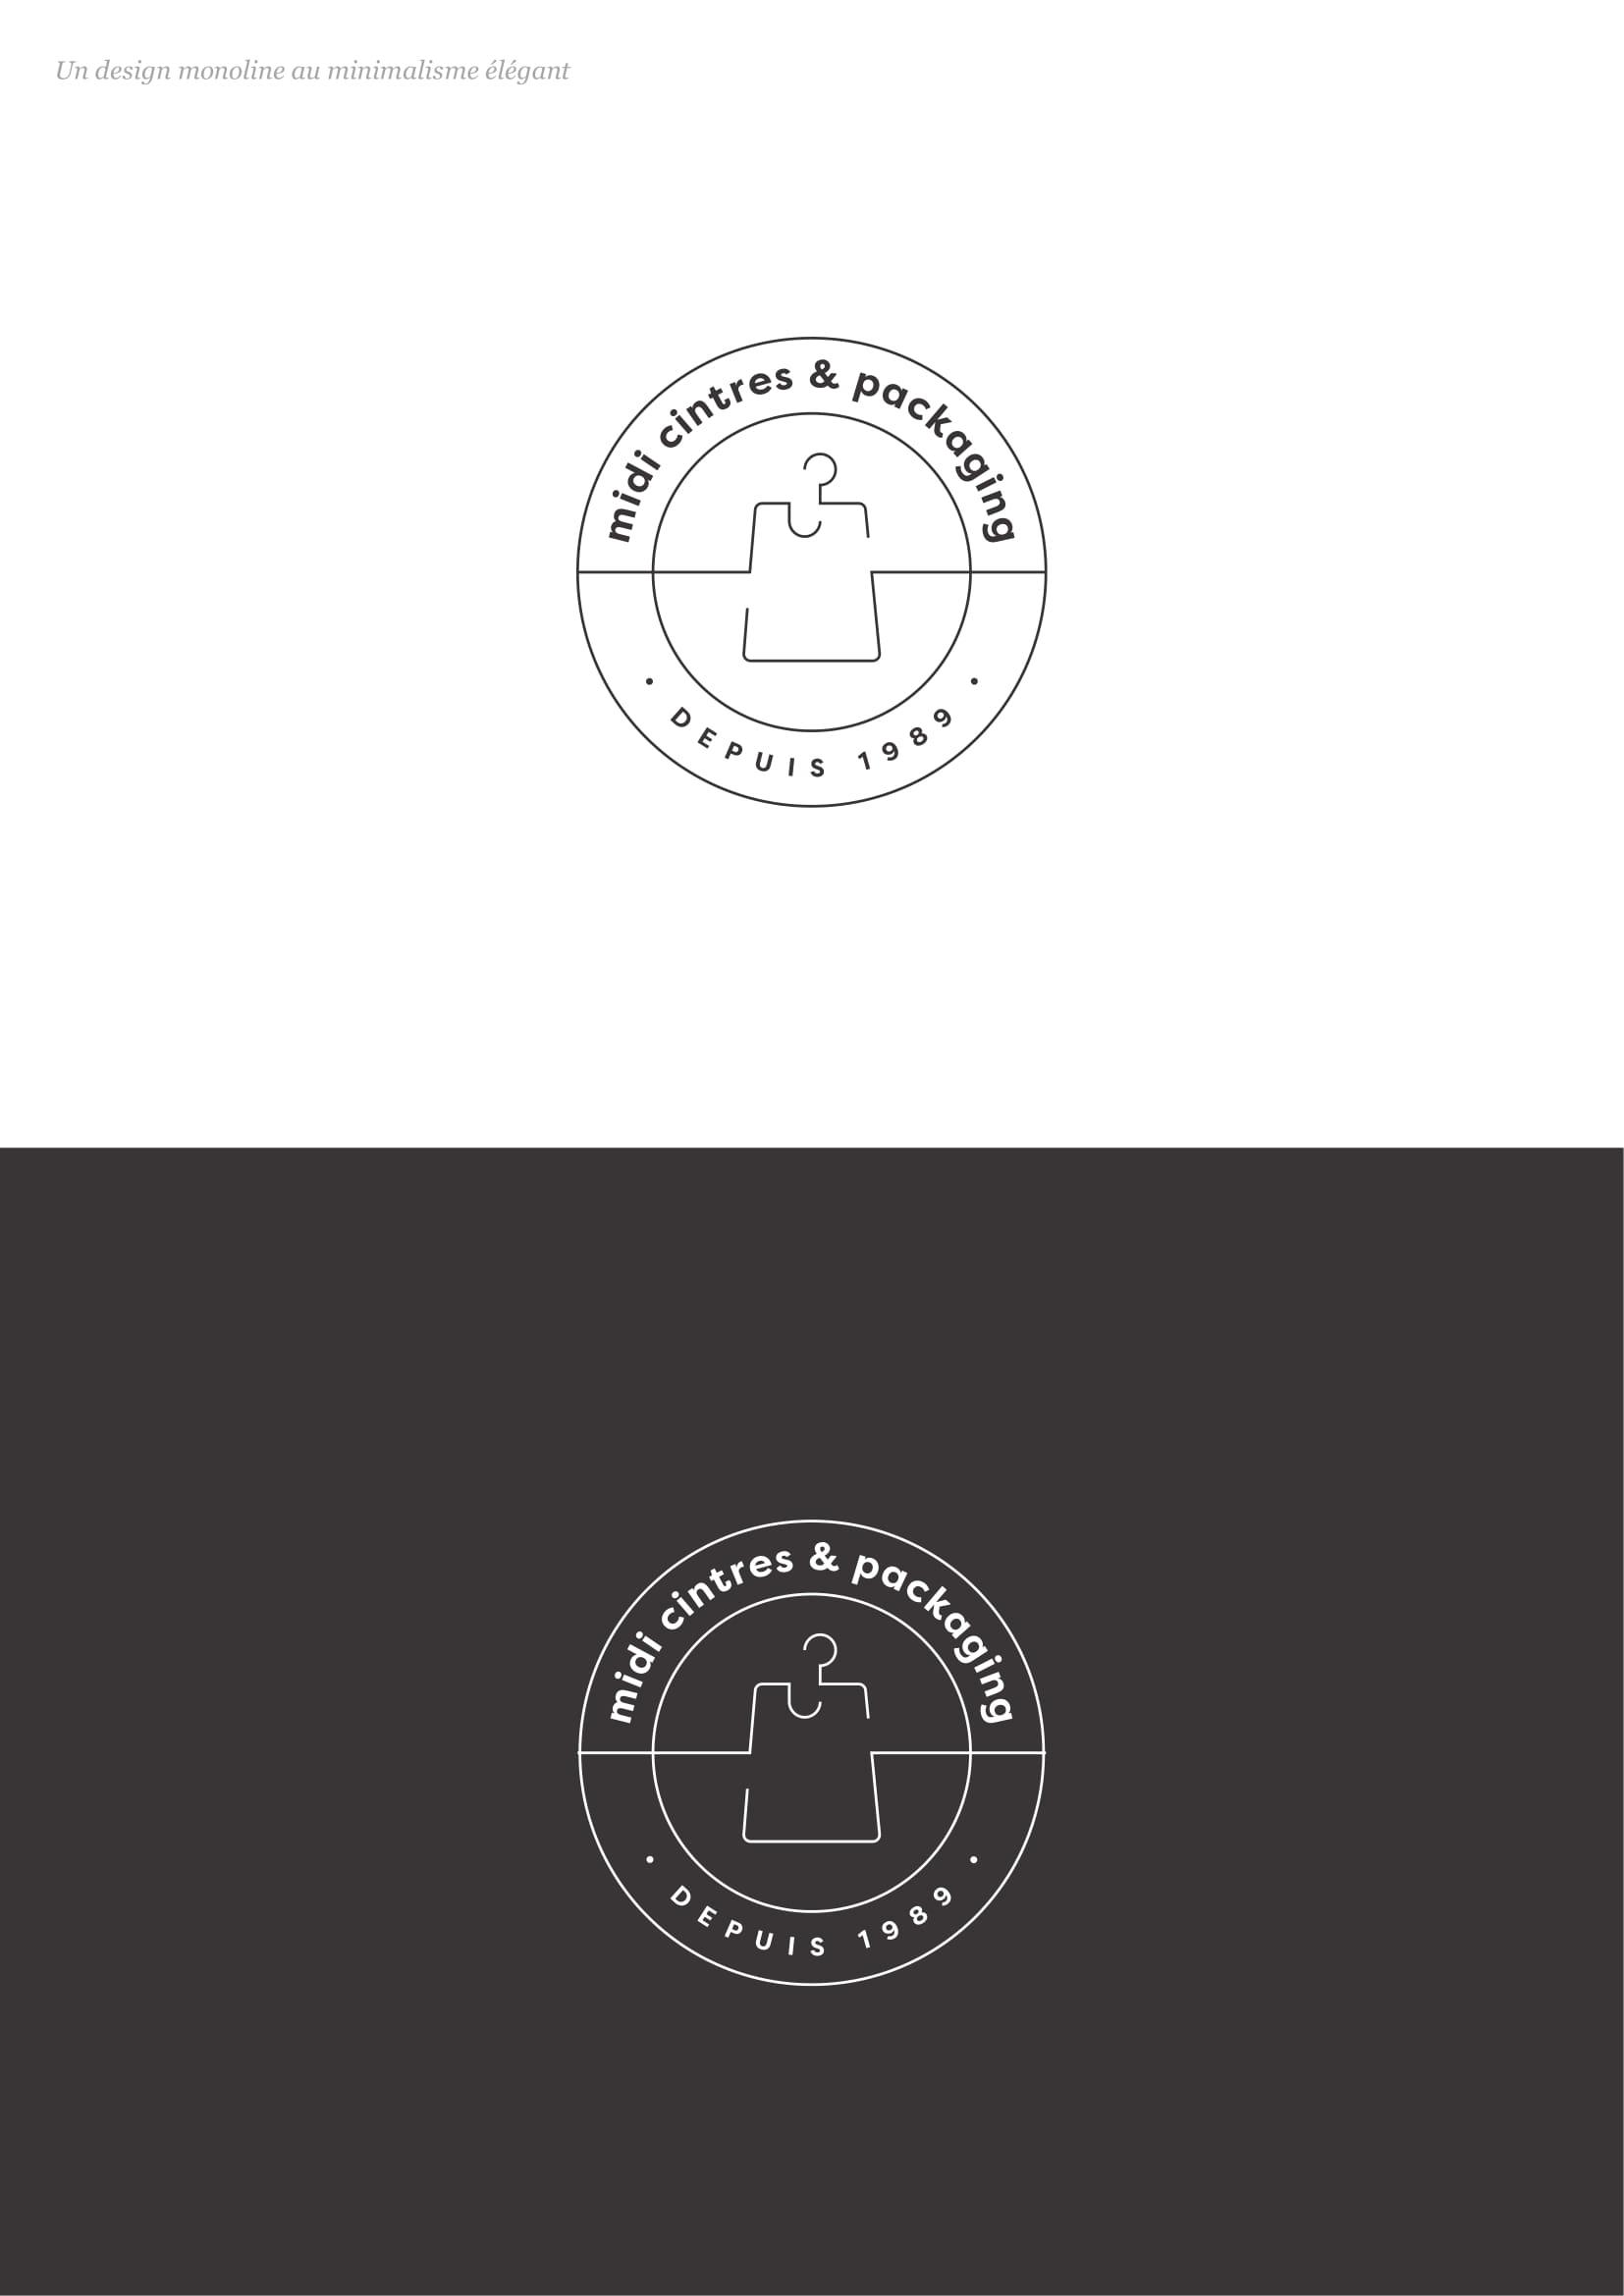 Graphiste logo minimaliste